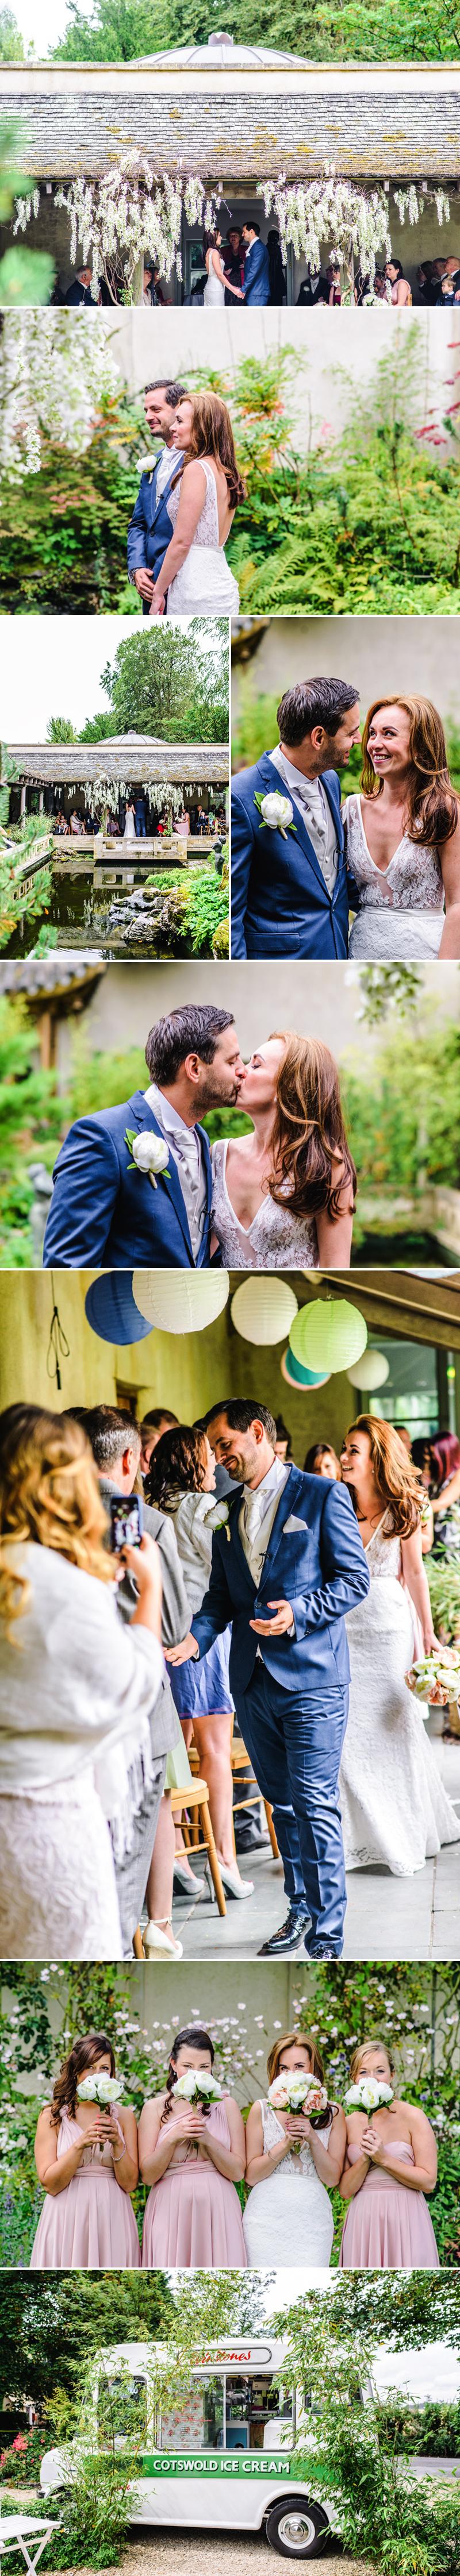 wedding-venues-in-gloucestershire-matara-centre-big-eye-photography-003